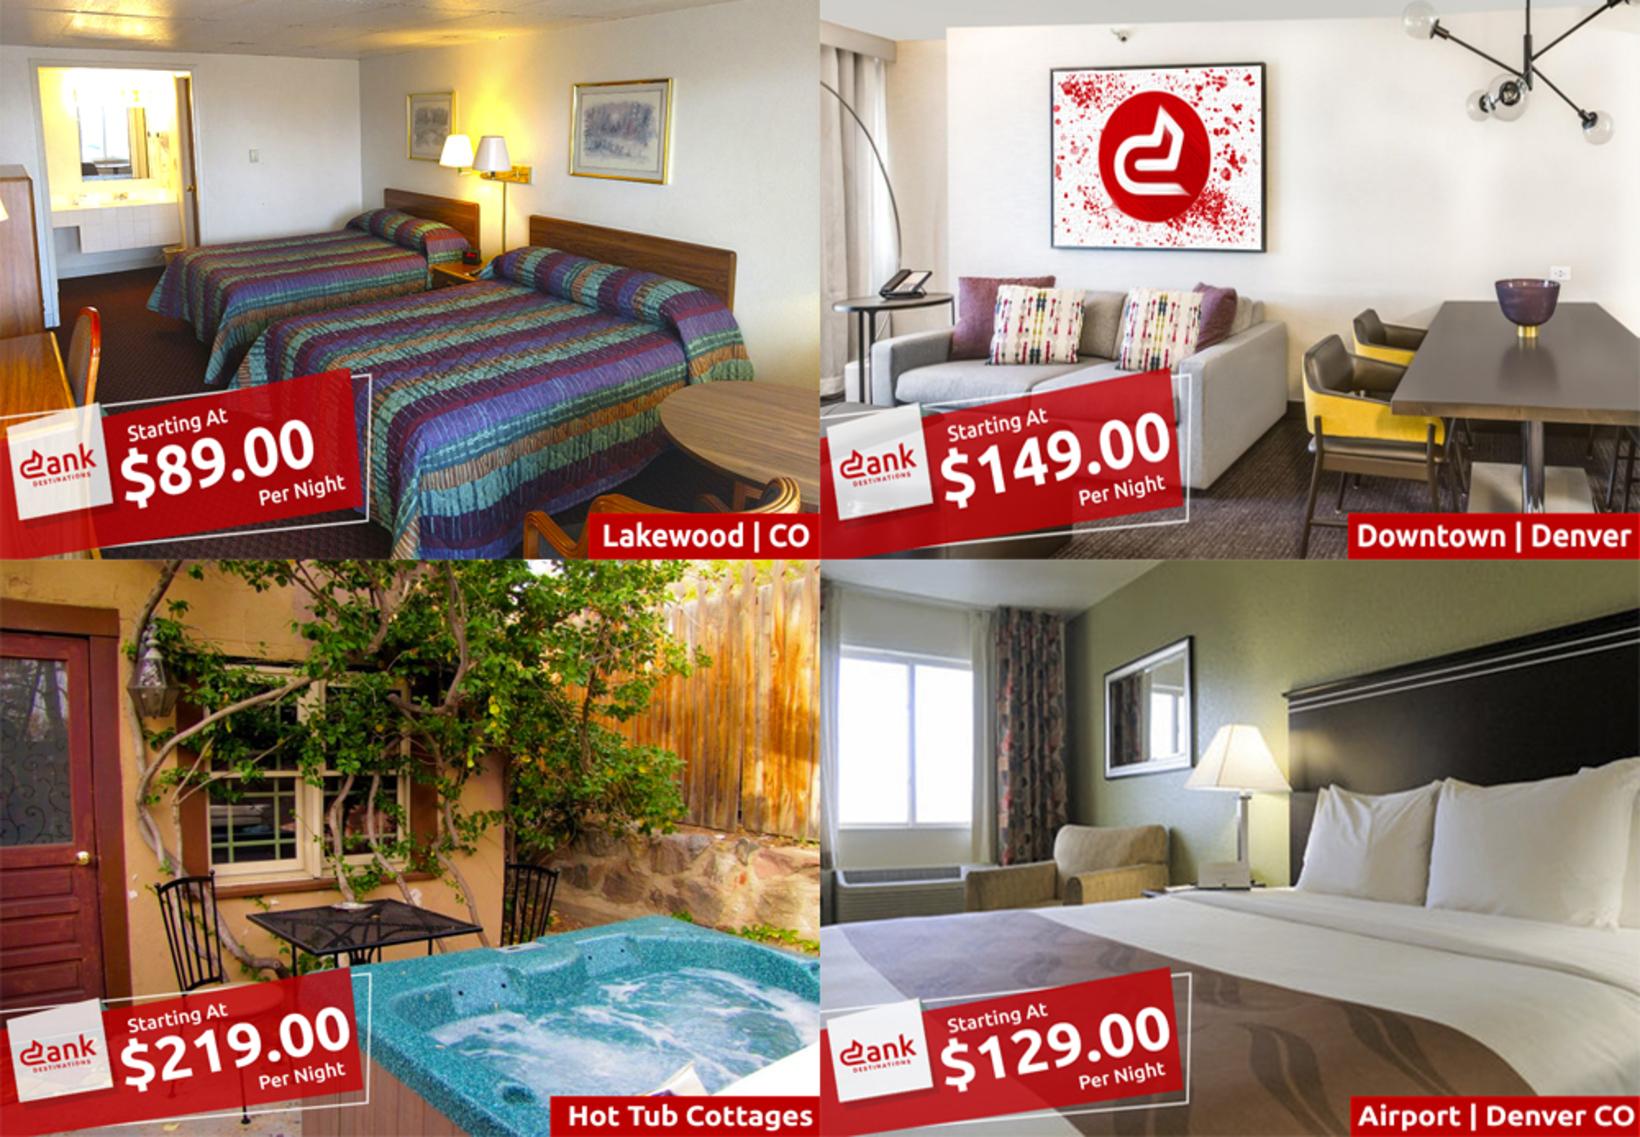 420 Friendly Hotels